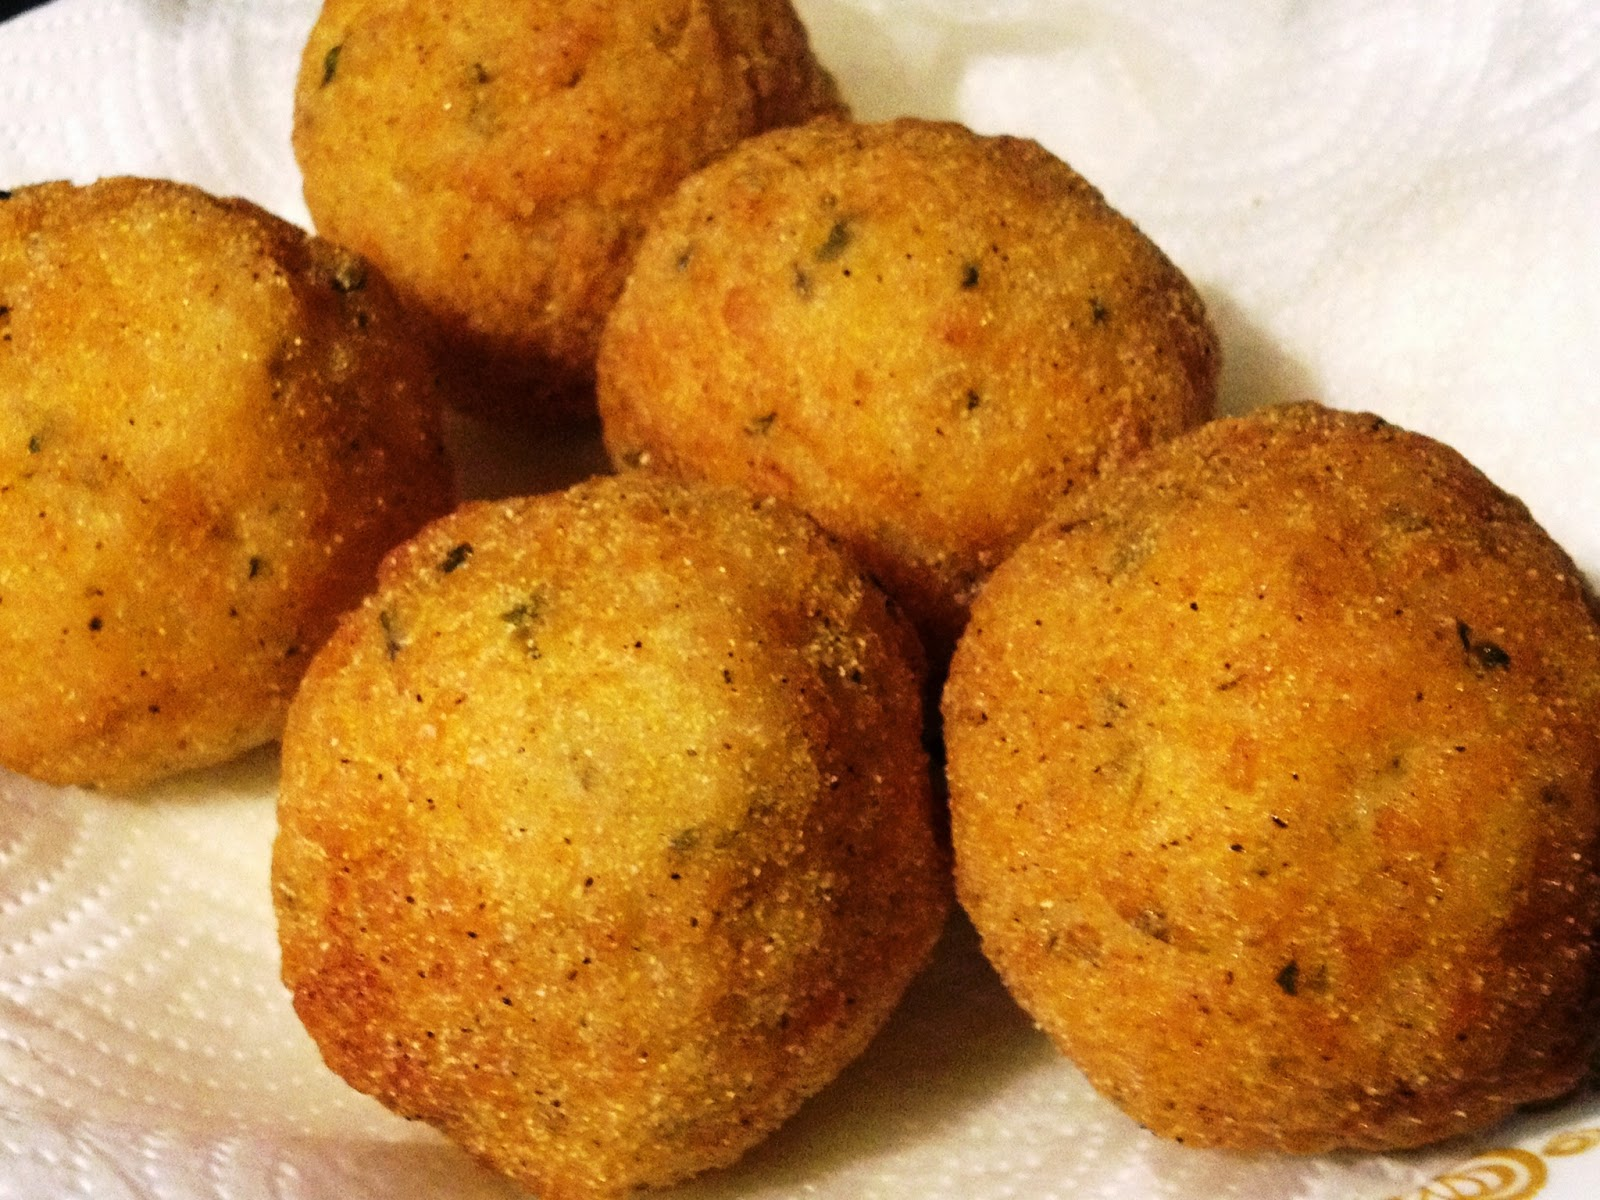 ... di Riso (Fried Italian Style Rice Balls Stuffed With Vegan Cheese